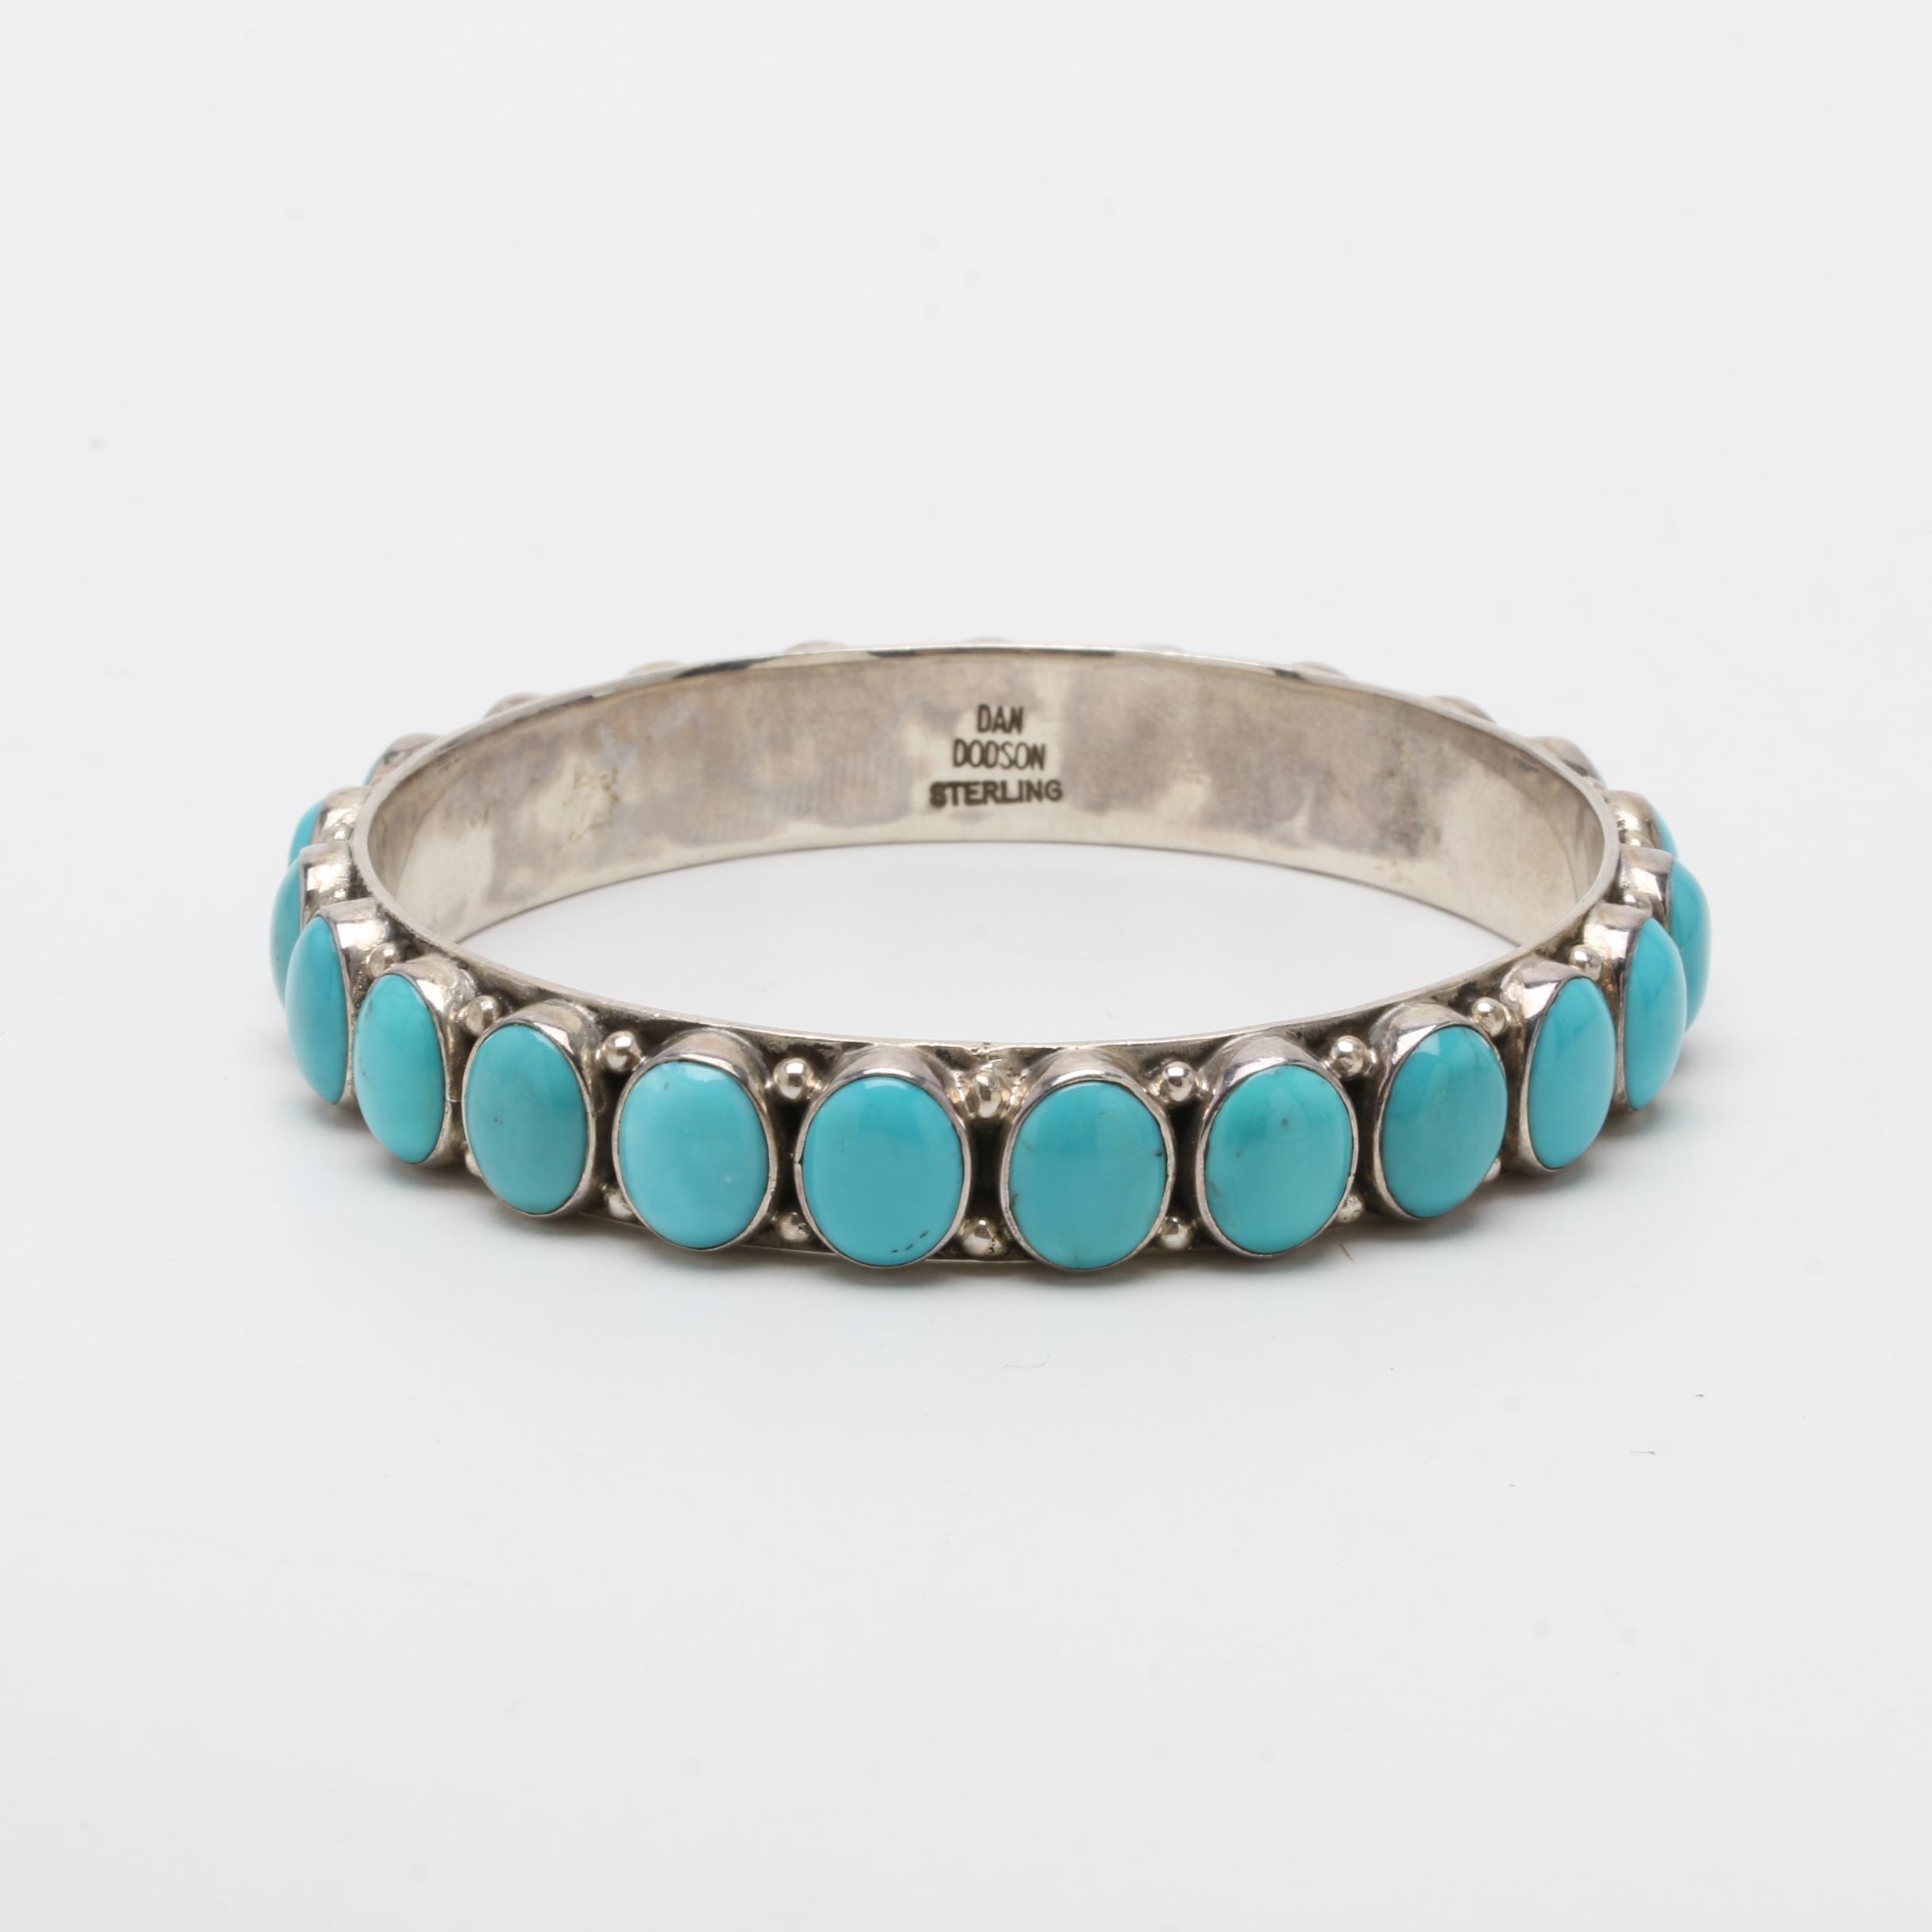 Dan Dodson Sterling Silver Stabilized Turquoise Bangle Bracelet